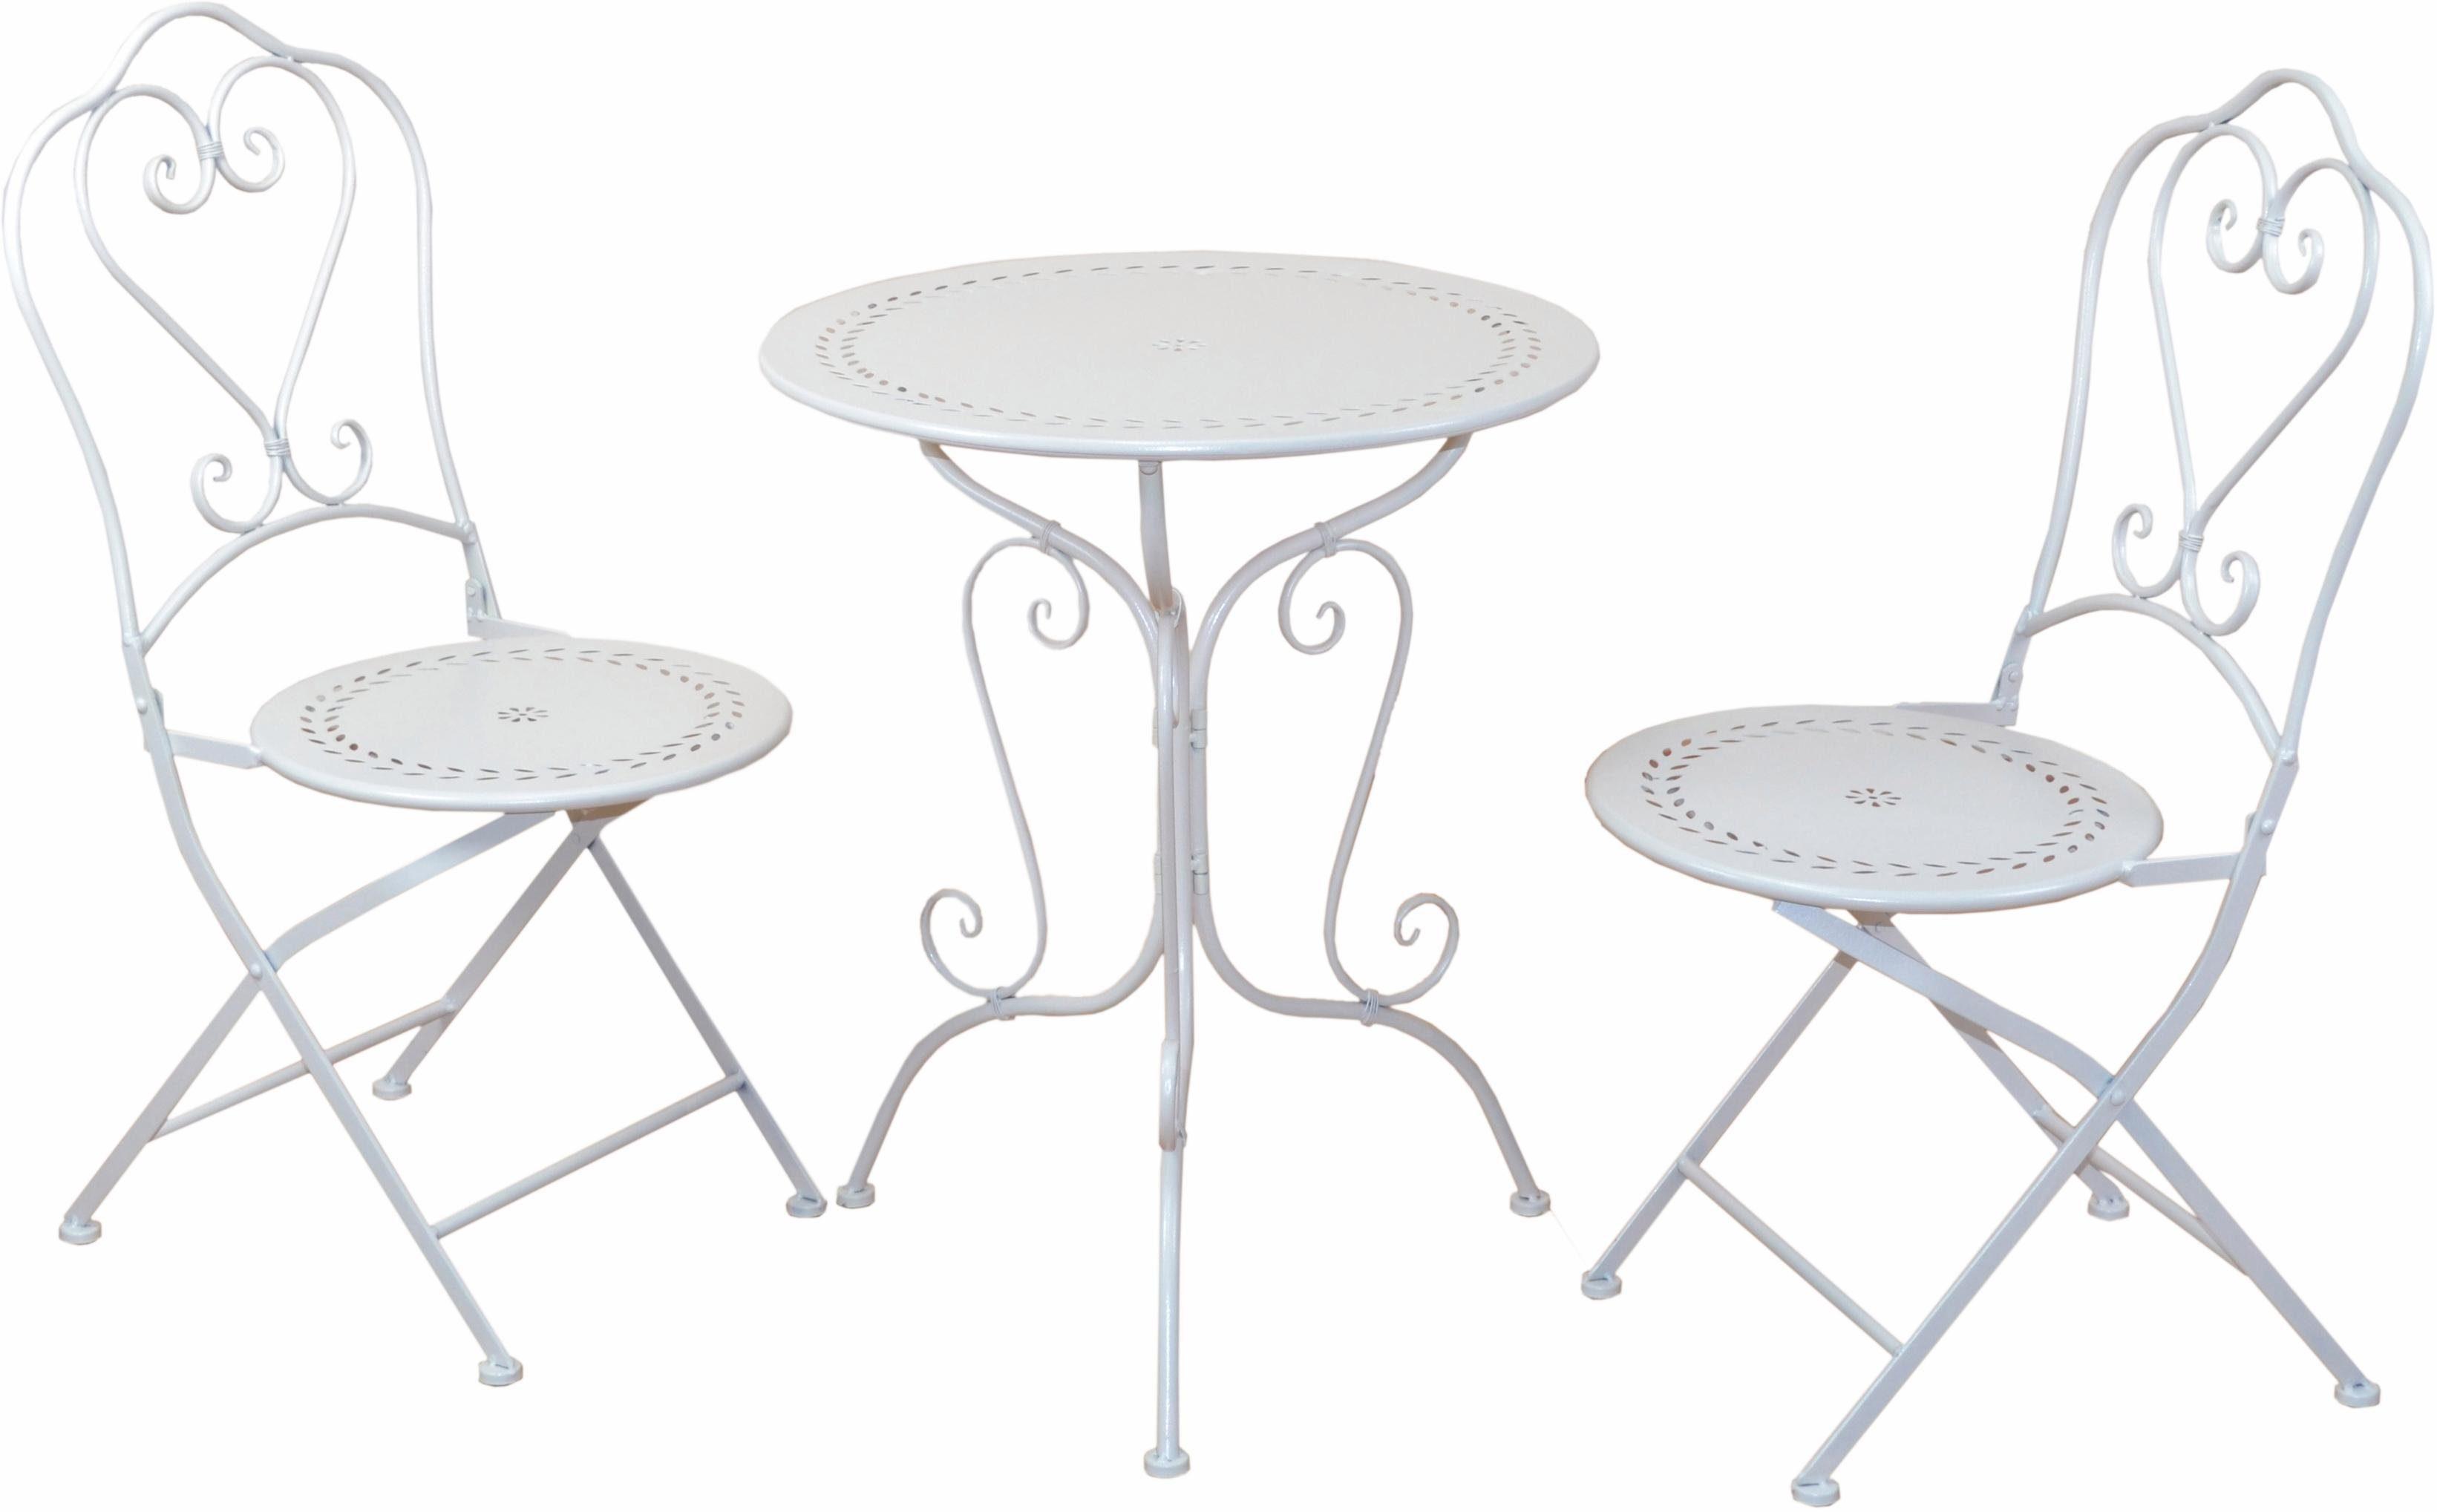 Home affaire Metall-Tischgruppe, 3-teiliges Set